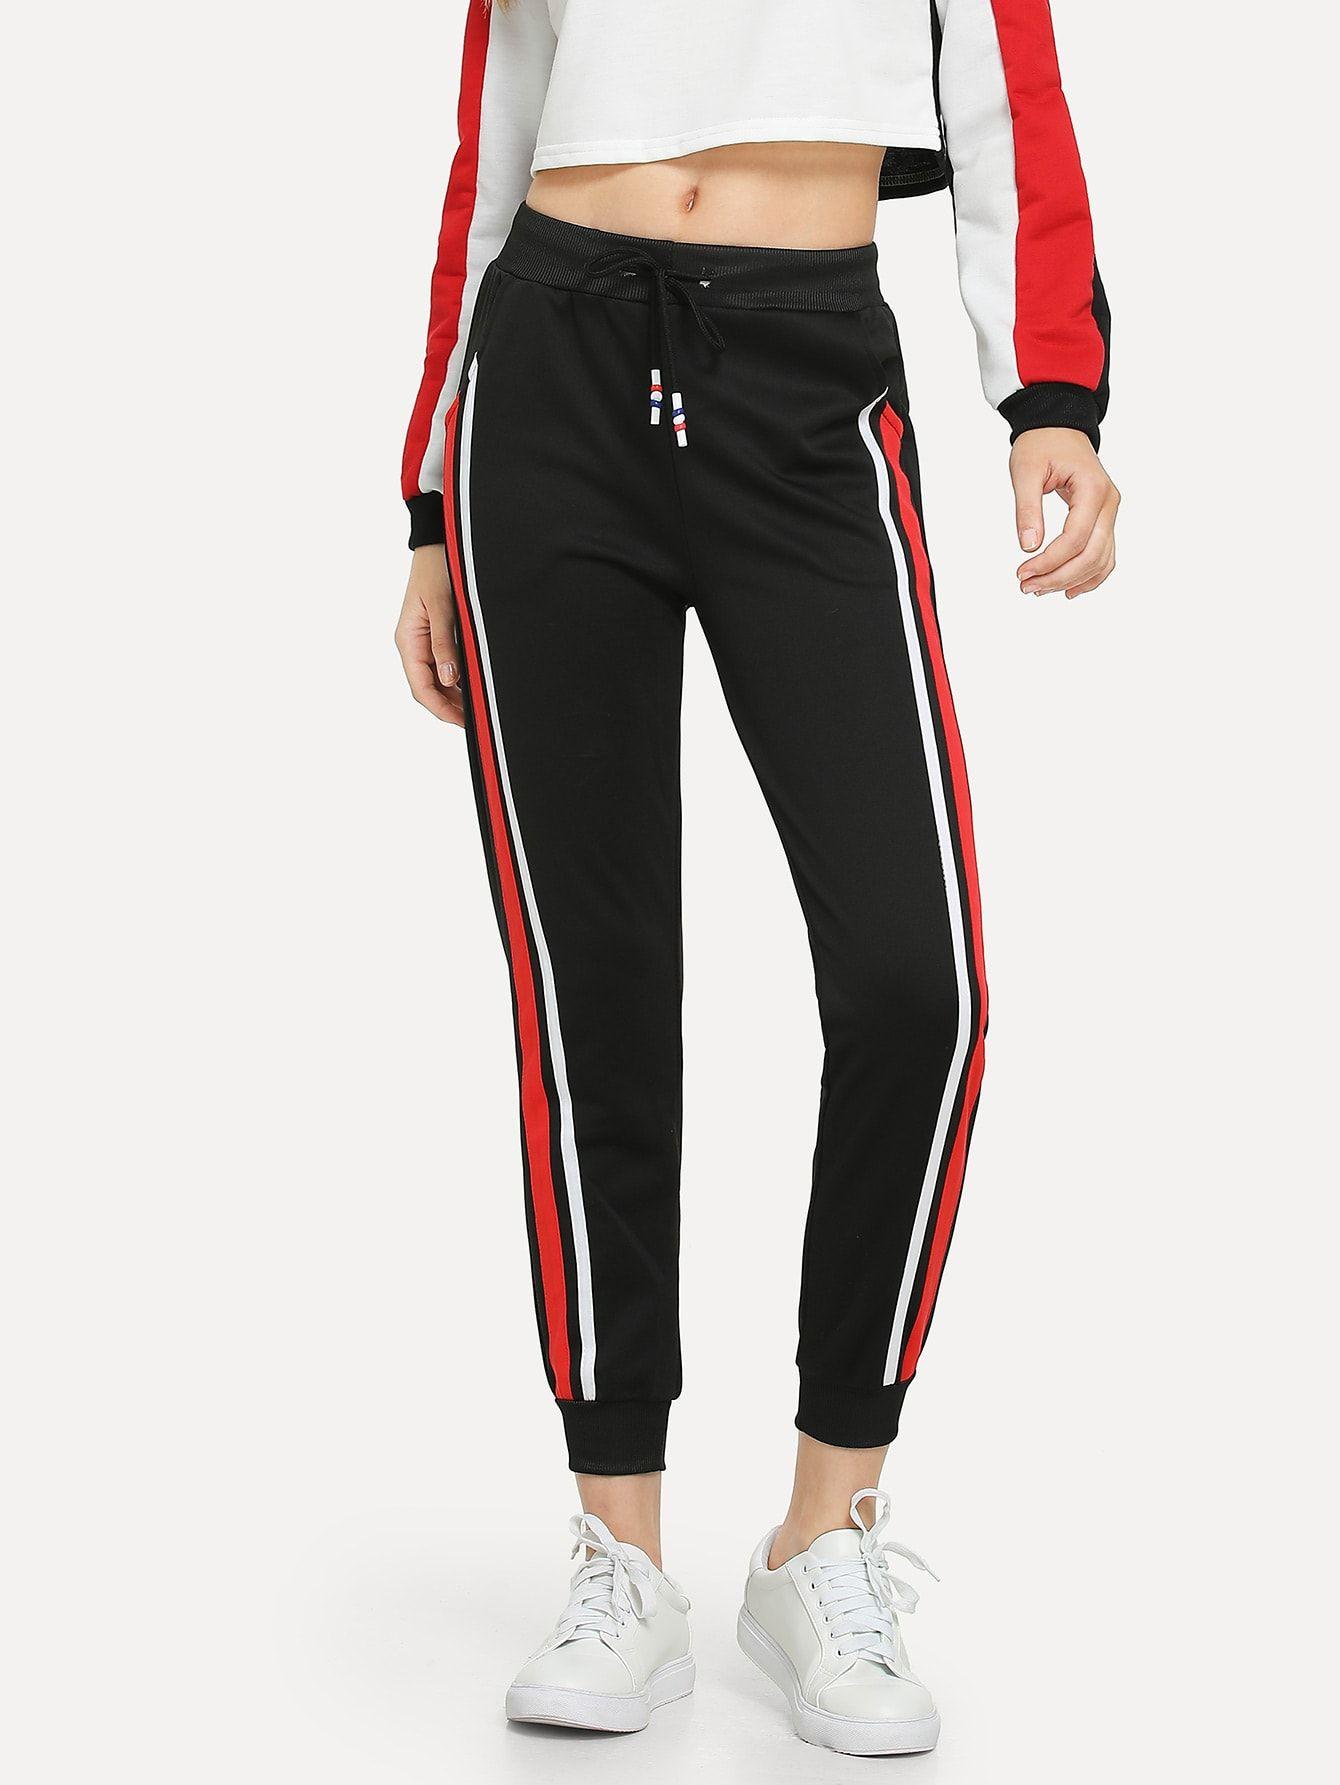 b08db04737e8f8 Sporty Striped Sweatpant Regular Elastic Waist High Waist Black Crop Length Drawstring  Waist Striped Side Pants